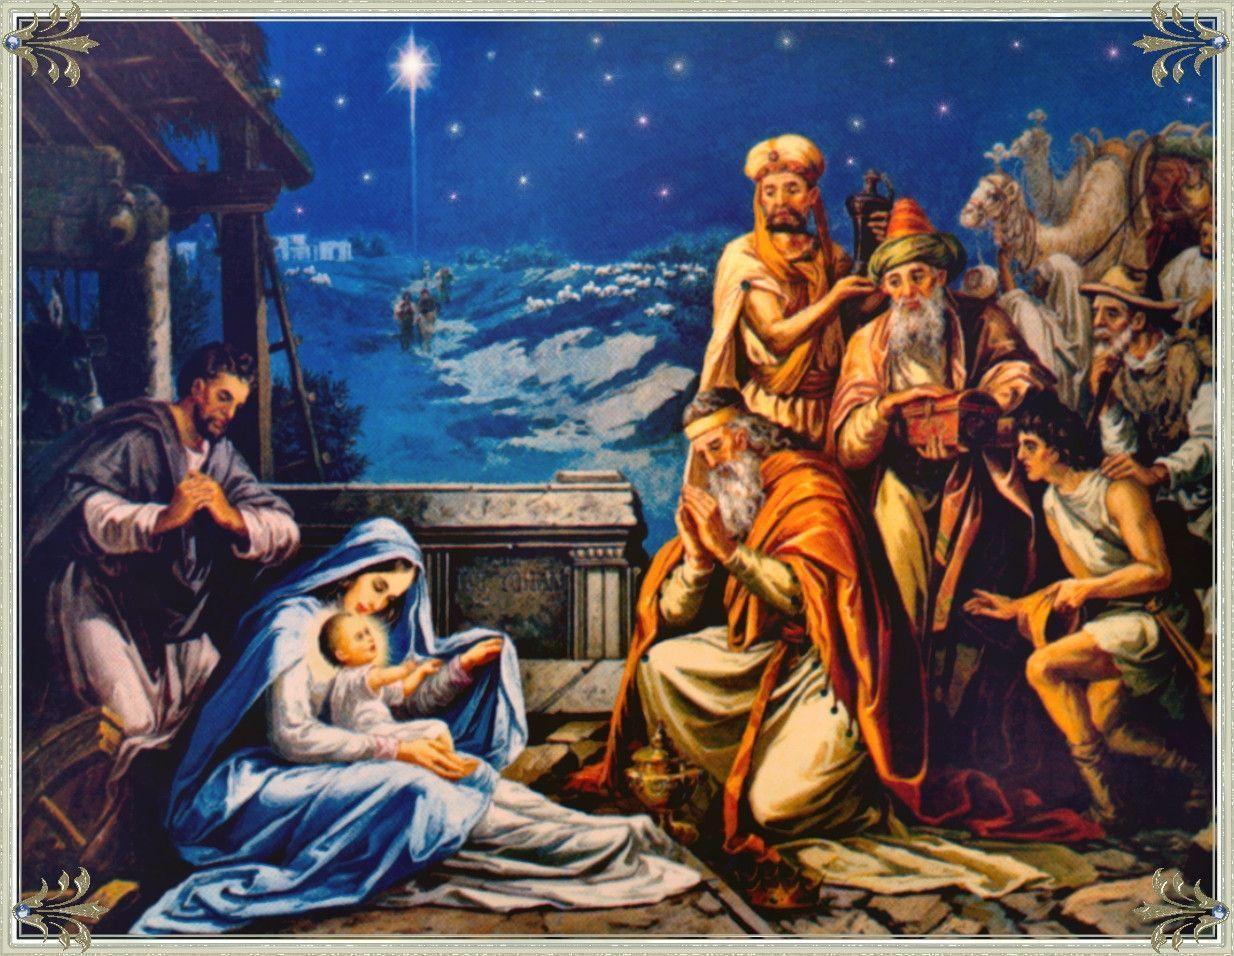 nativity scene desktop wallpapers